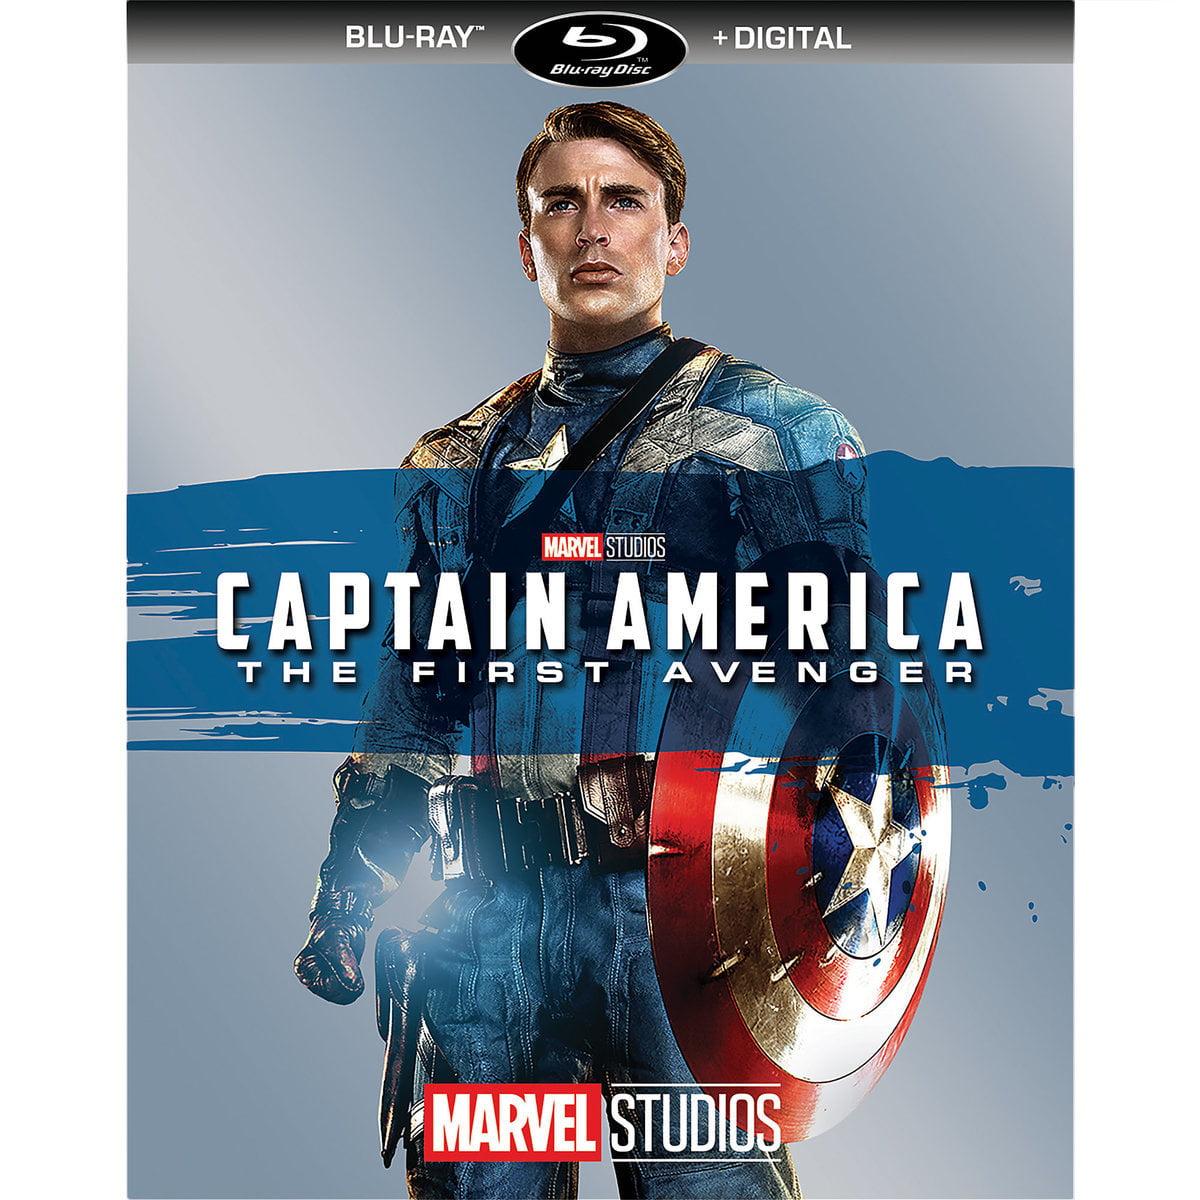 Captain America: The First Avenger (Blu-ray + Digital)